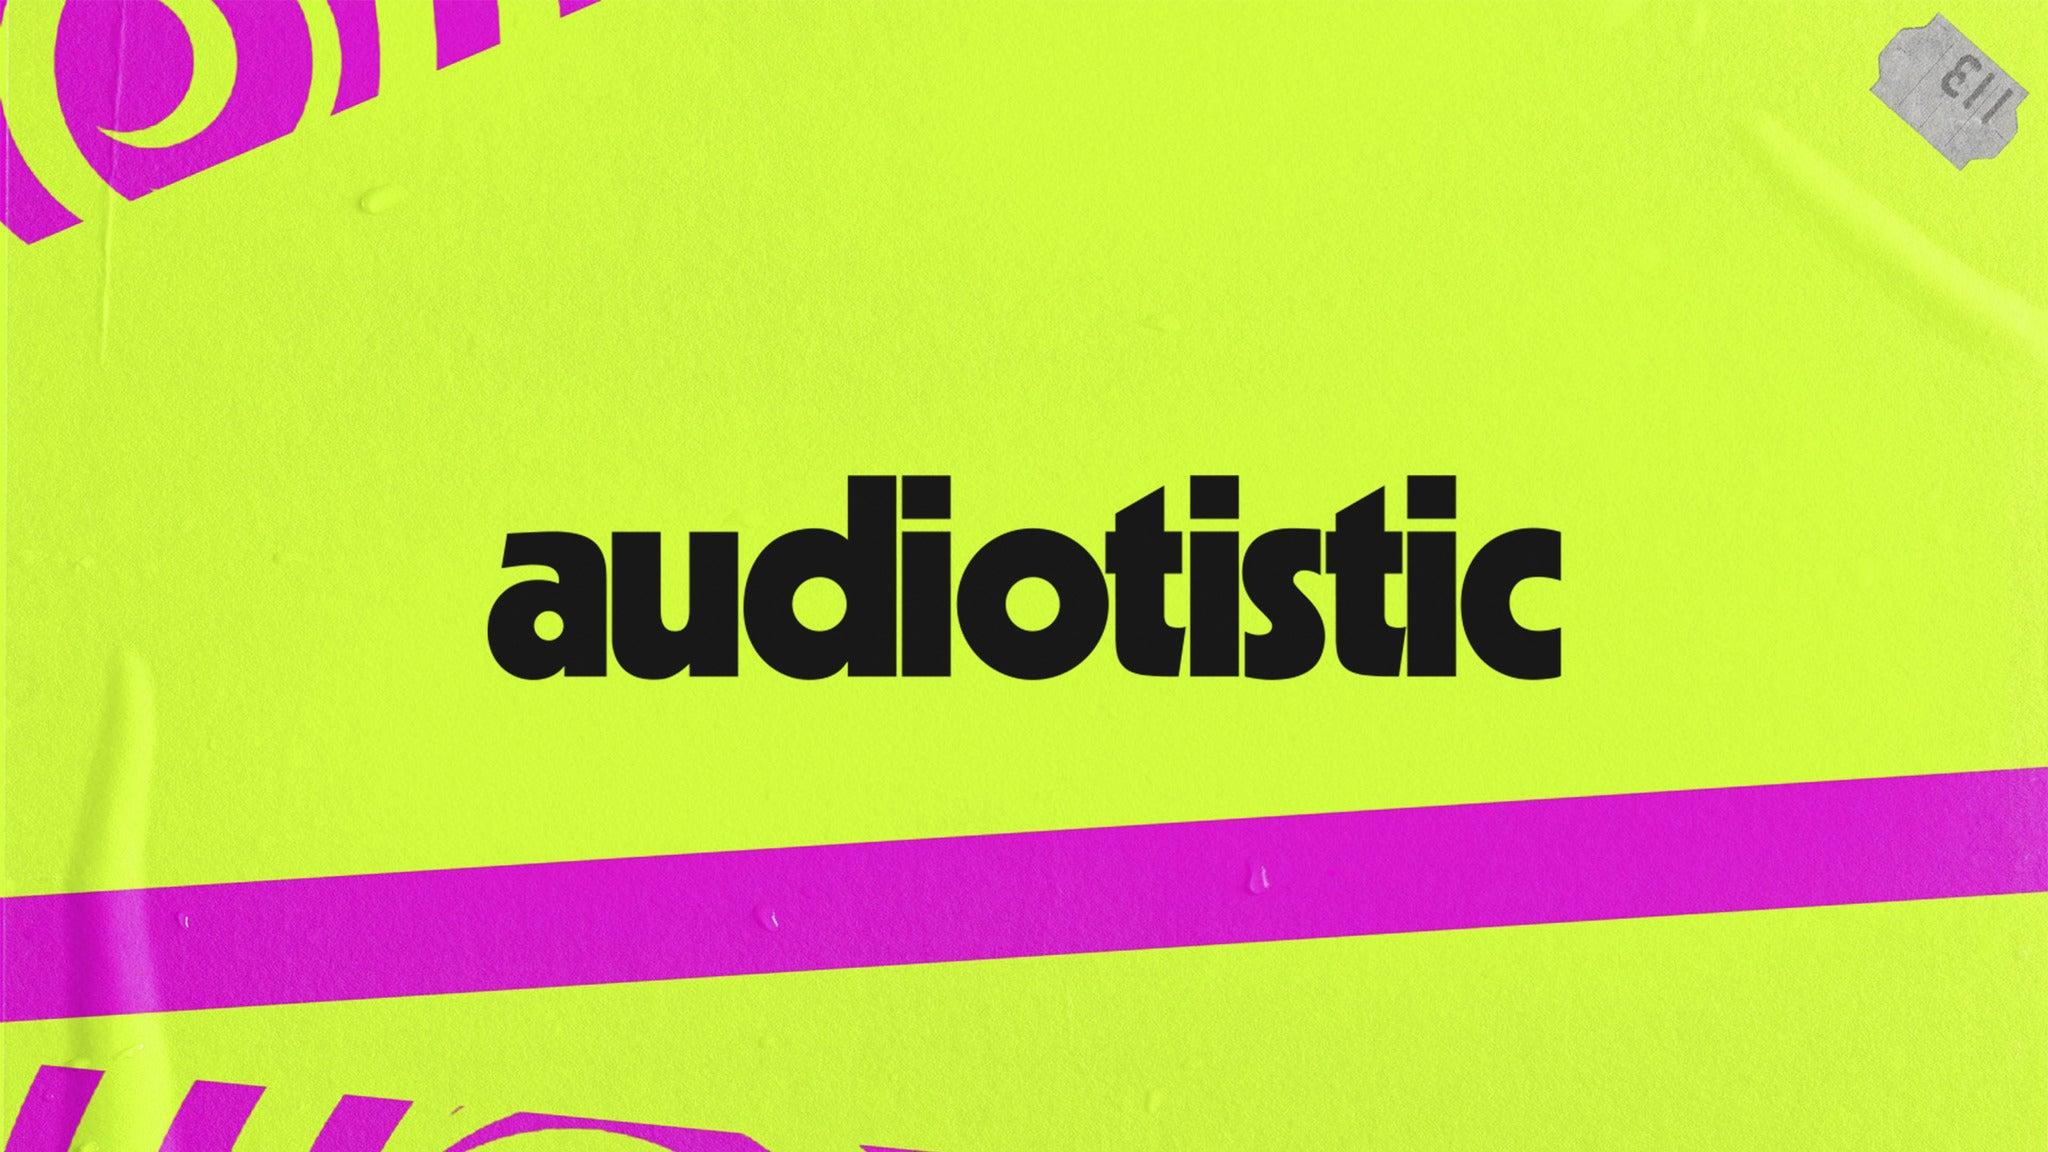 Audiotistic Bay Area at Shoreline Amphitheatre